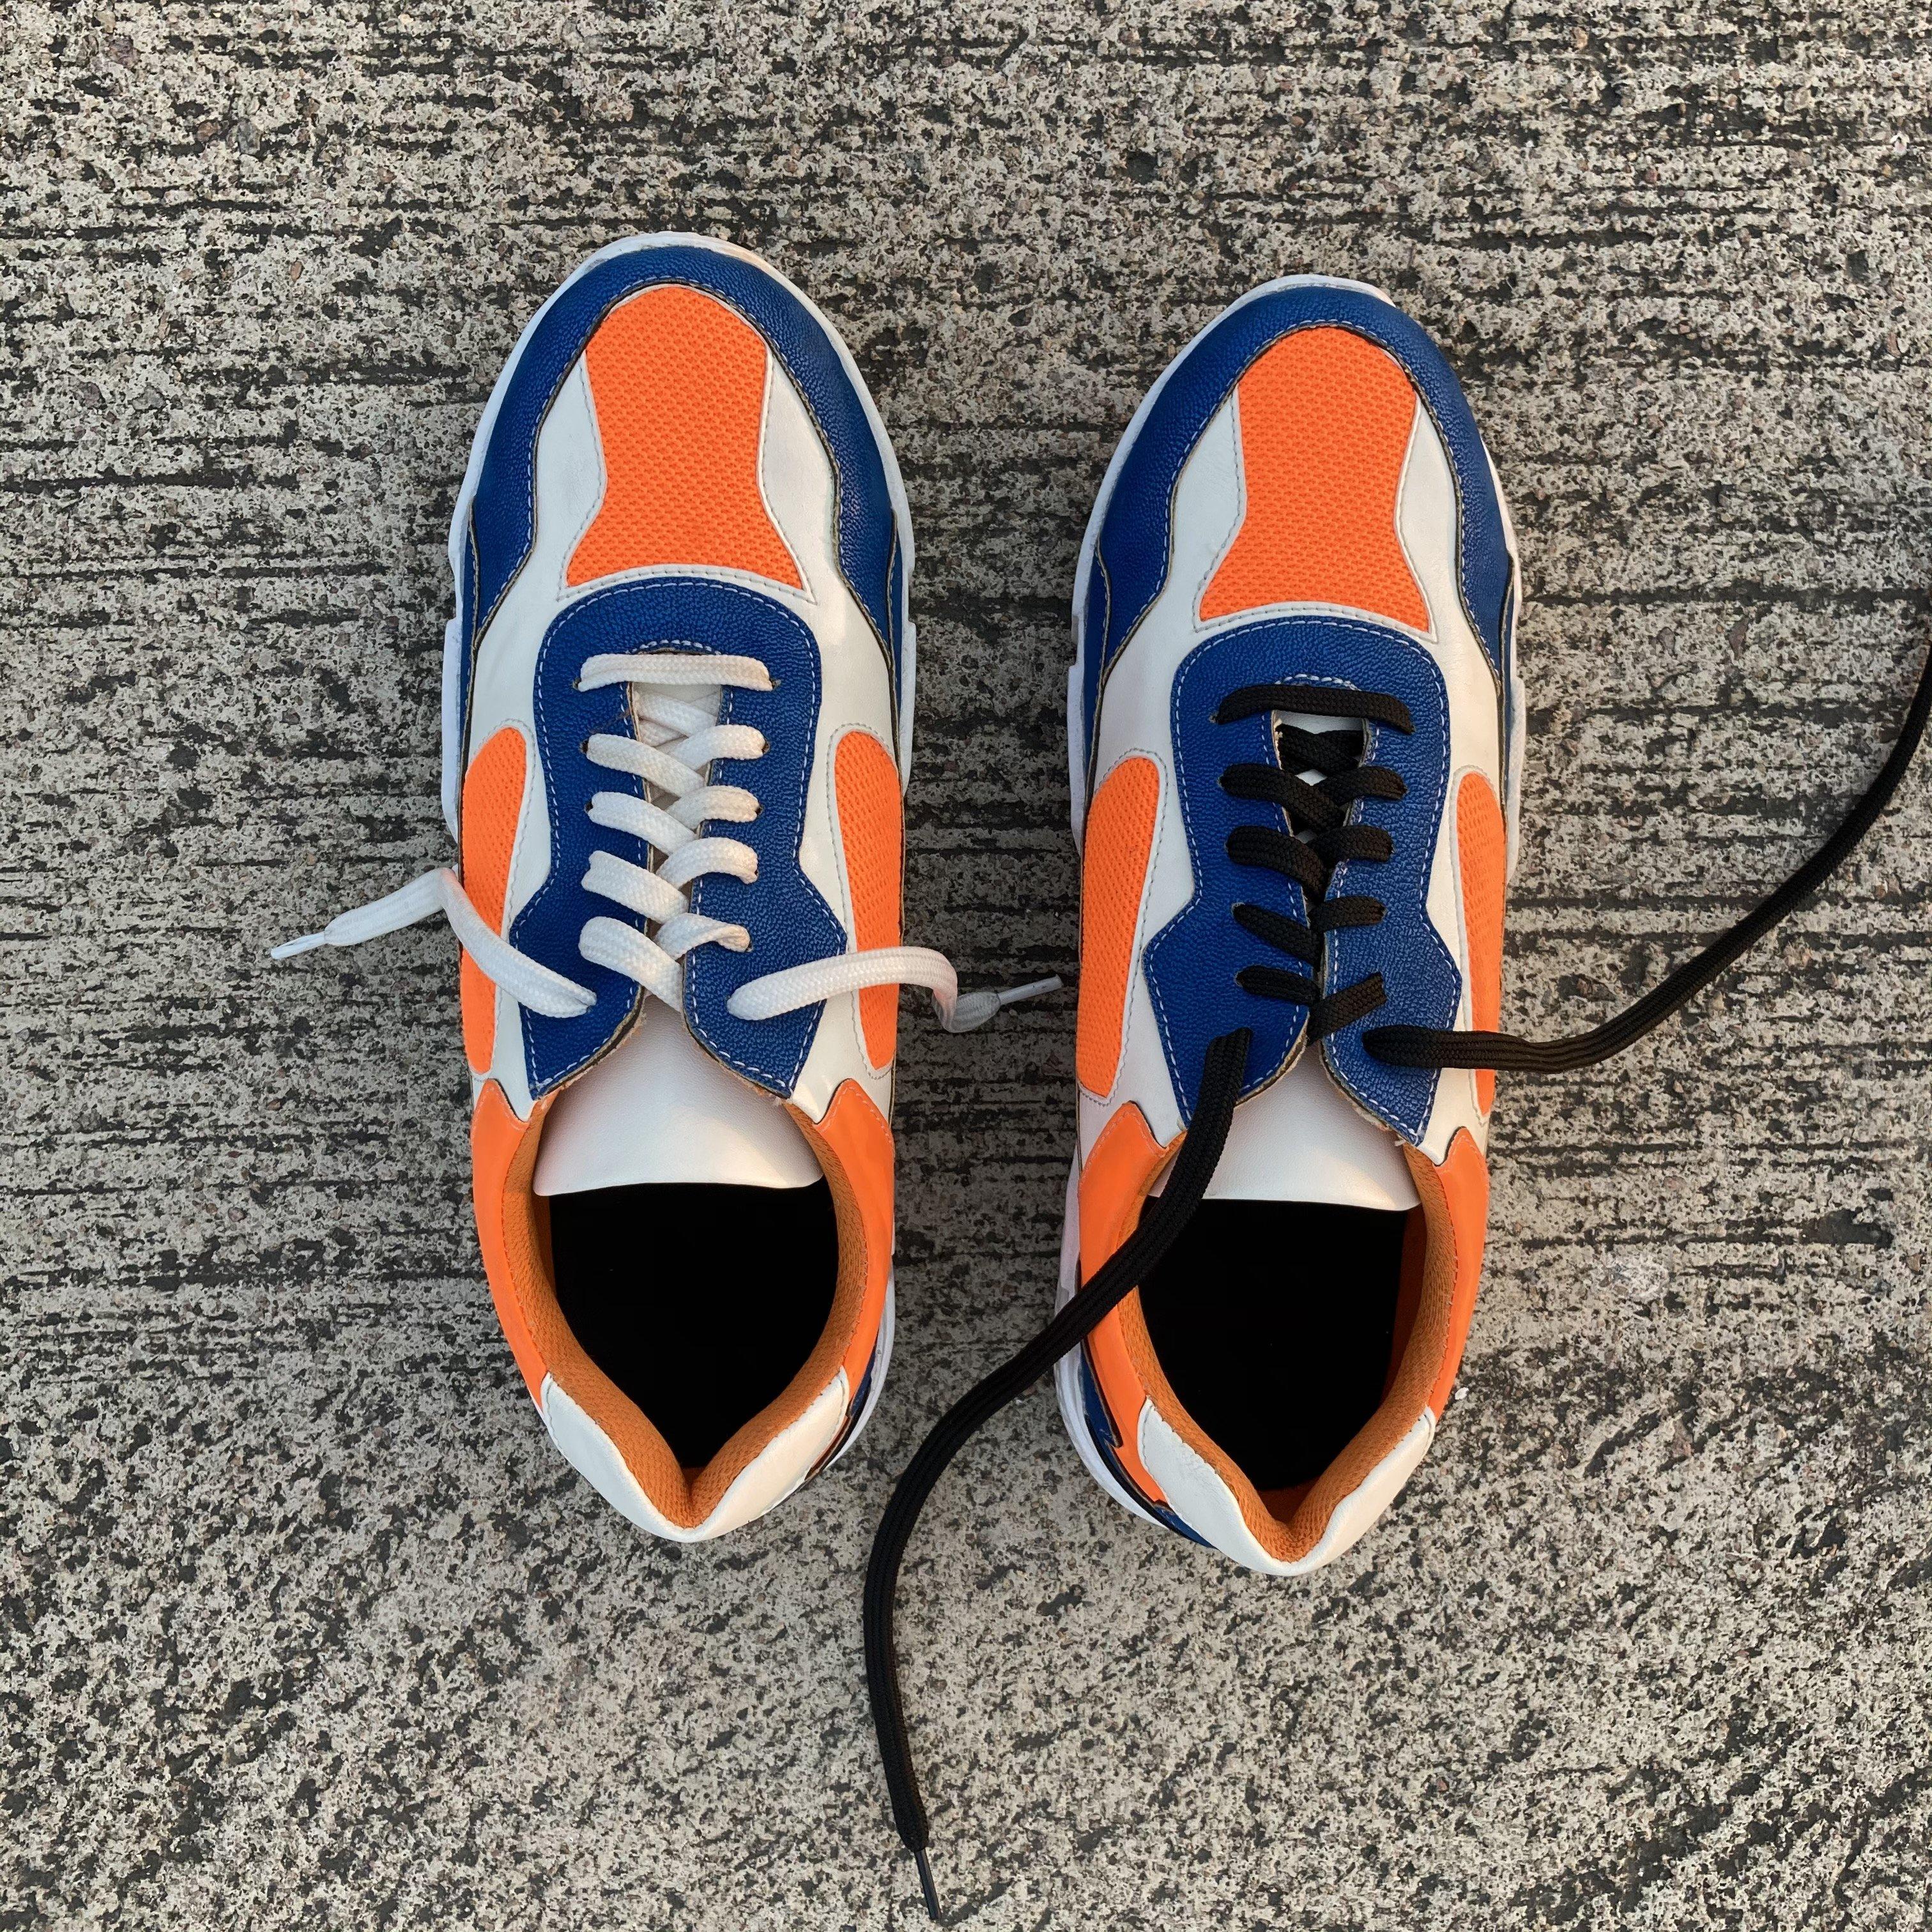 FF FUNKFEETS |  Xtreme Sneakers- Adam On Earth